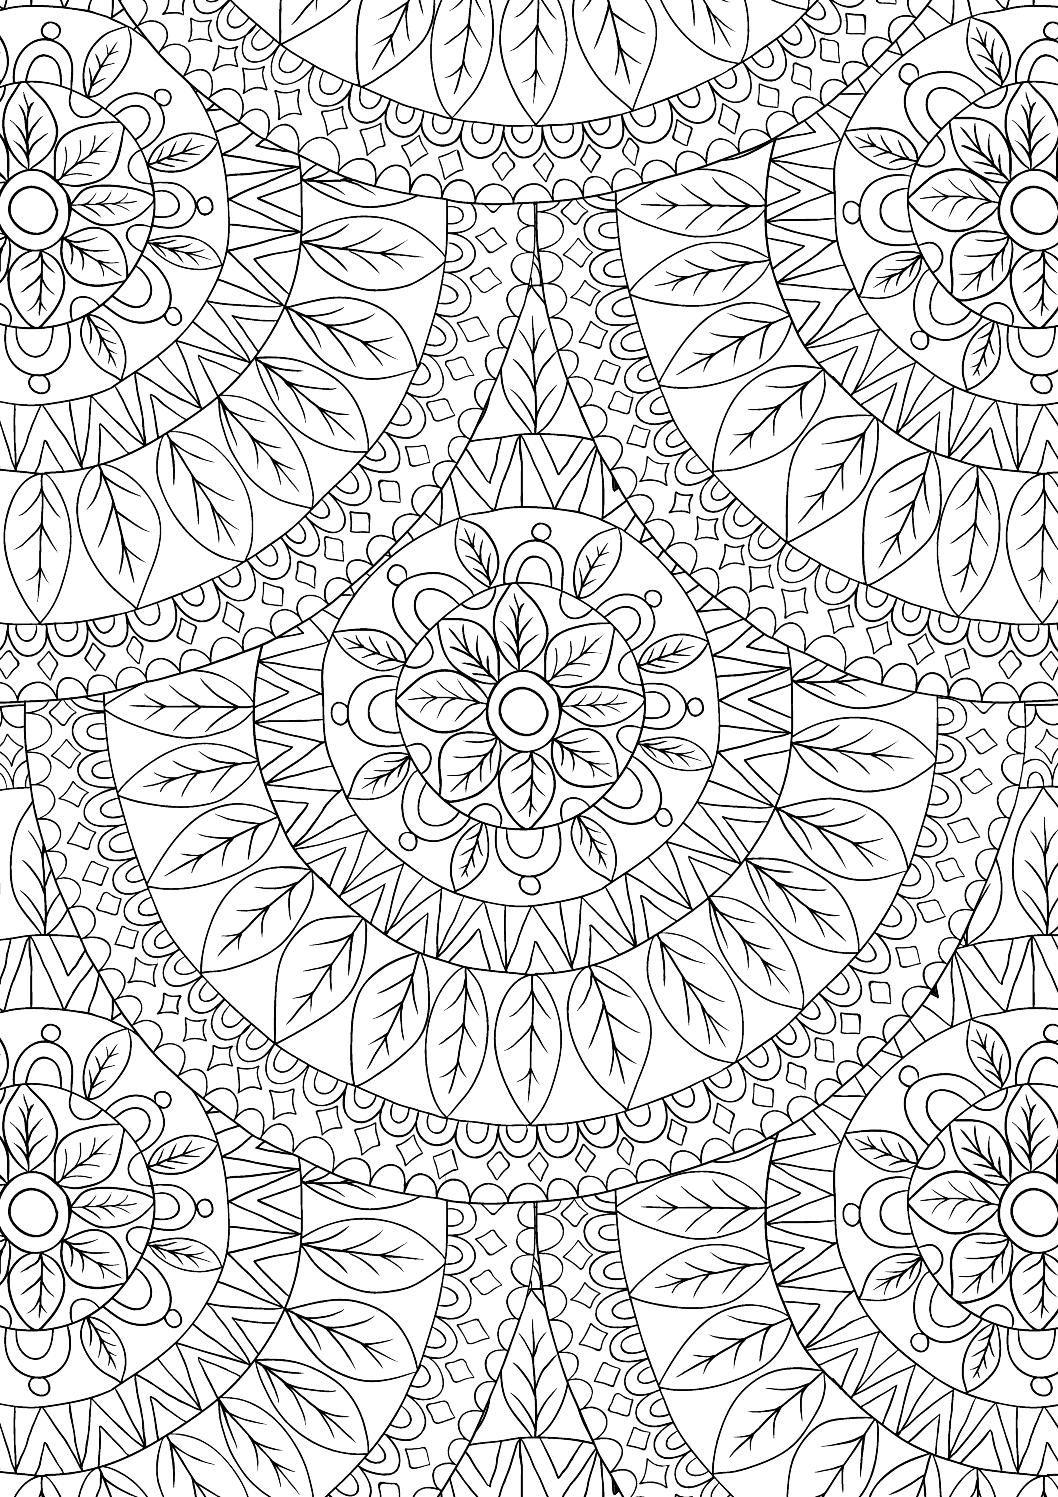 Didzioji mandalu knyga who needs stress pinterest coloring